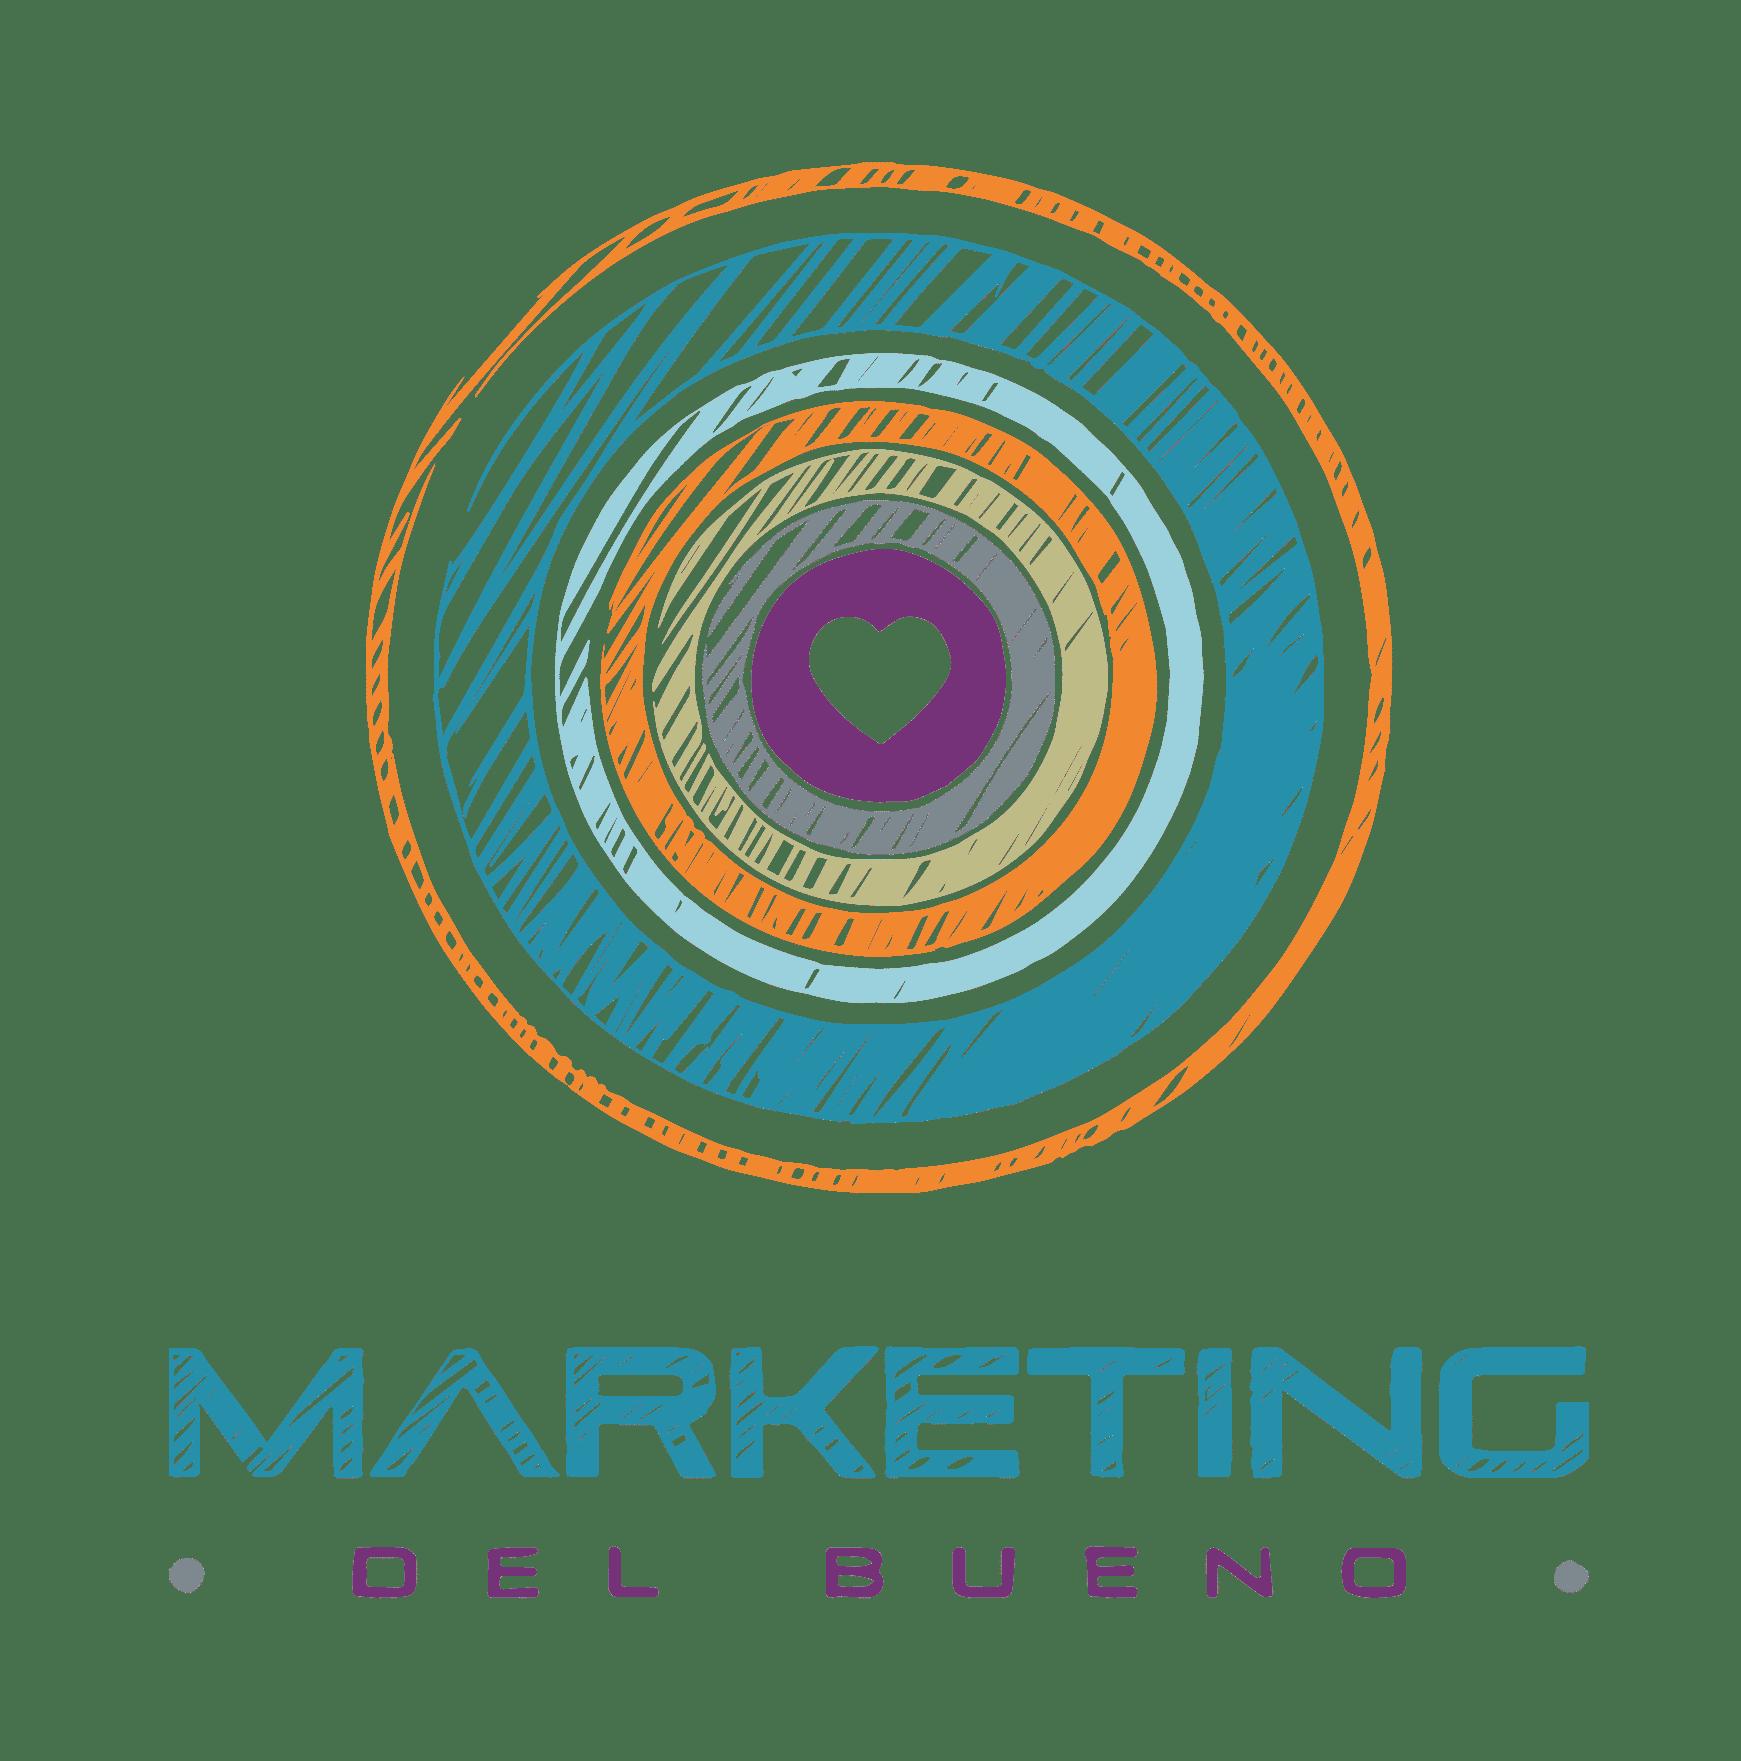 logo-marketing-del-bueno